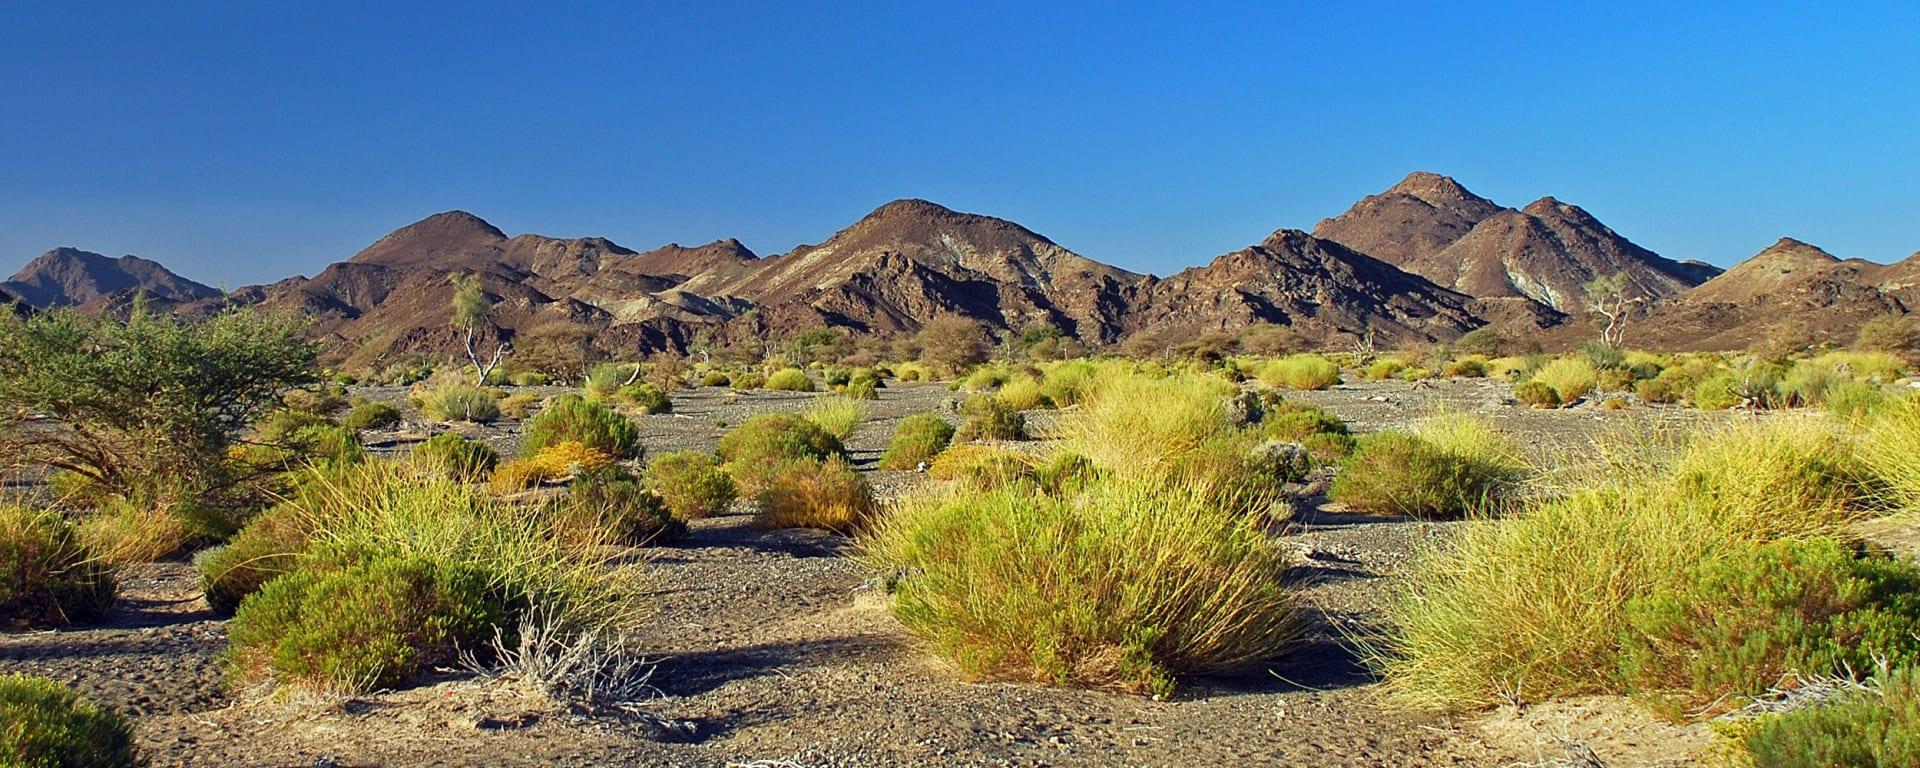 Rub al Khali, DE, Ganztägig in Salalah: Oman Rub al Khali Wüste